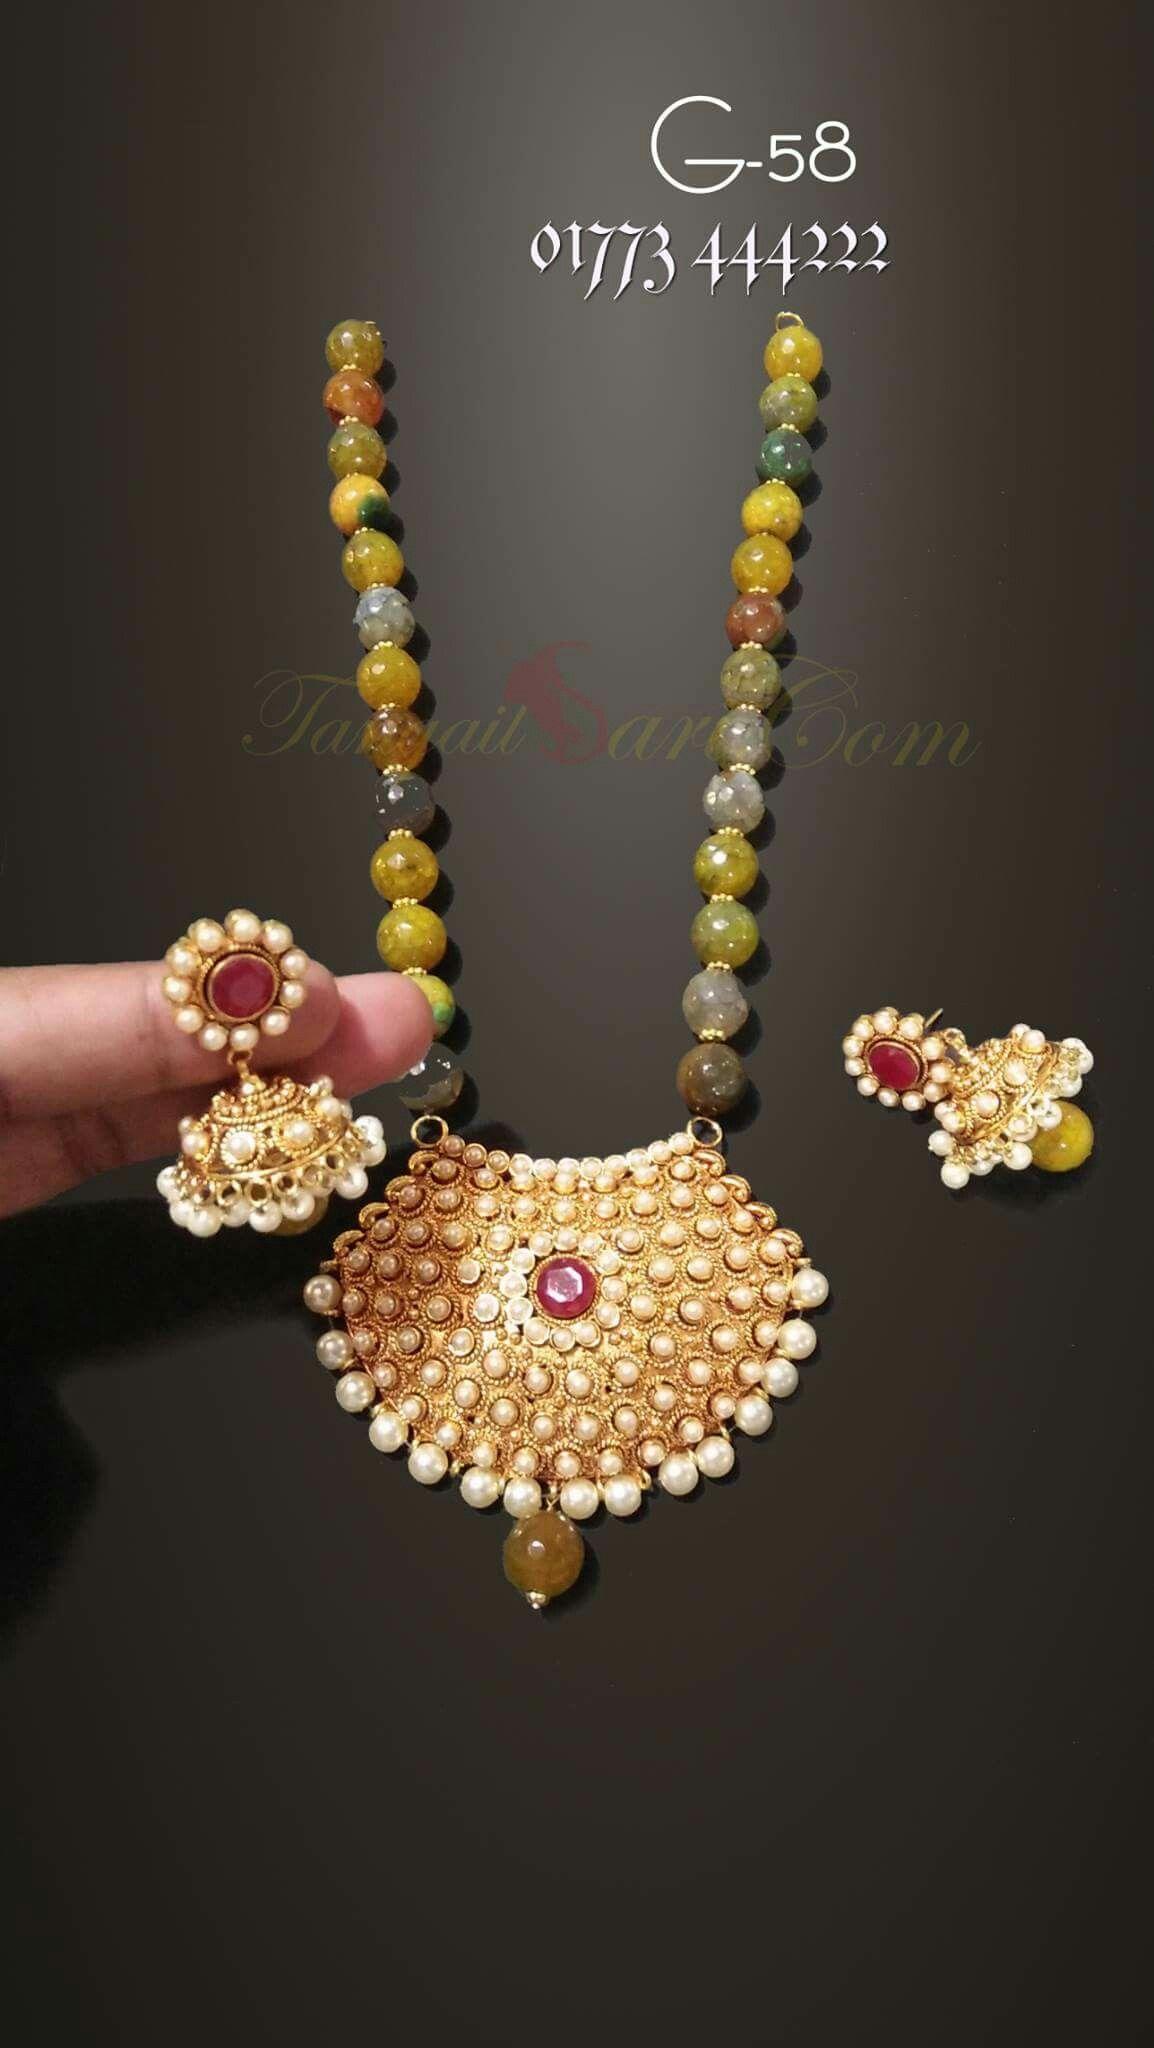 Pin by nurjahan akter on love jewellry pinterest